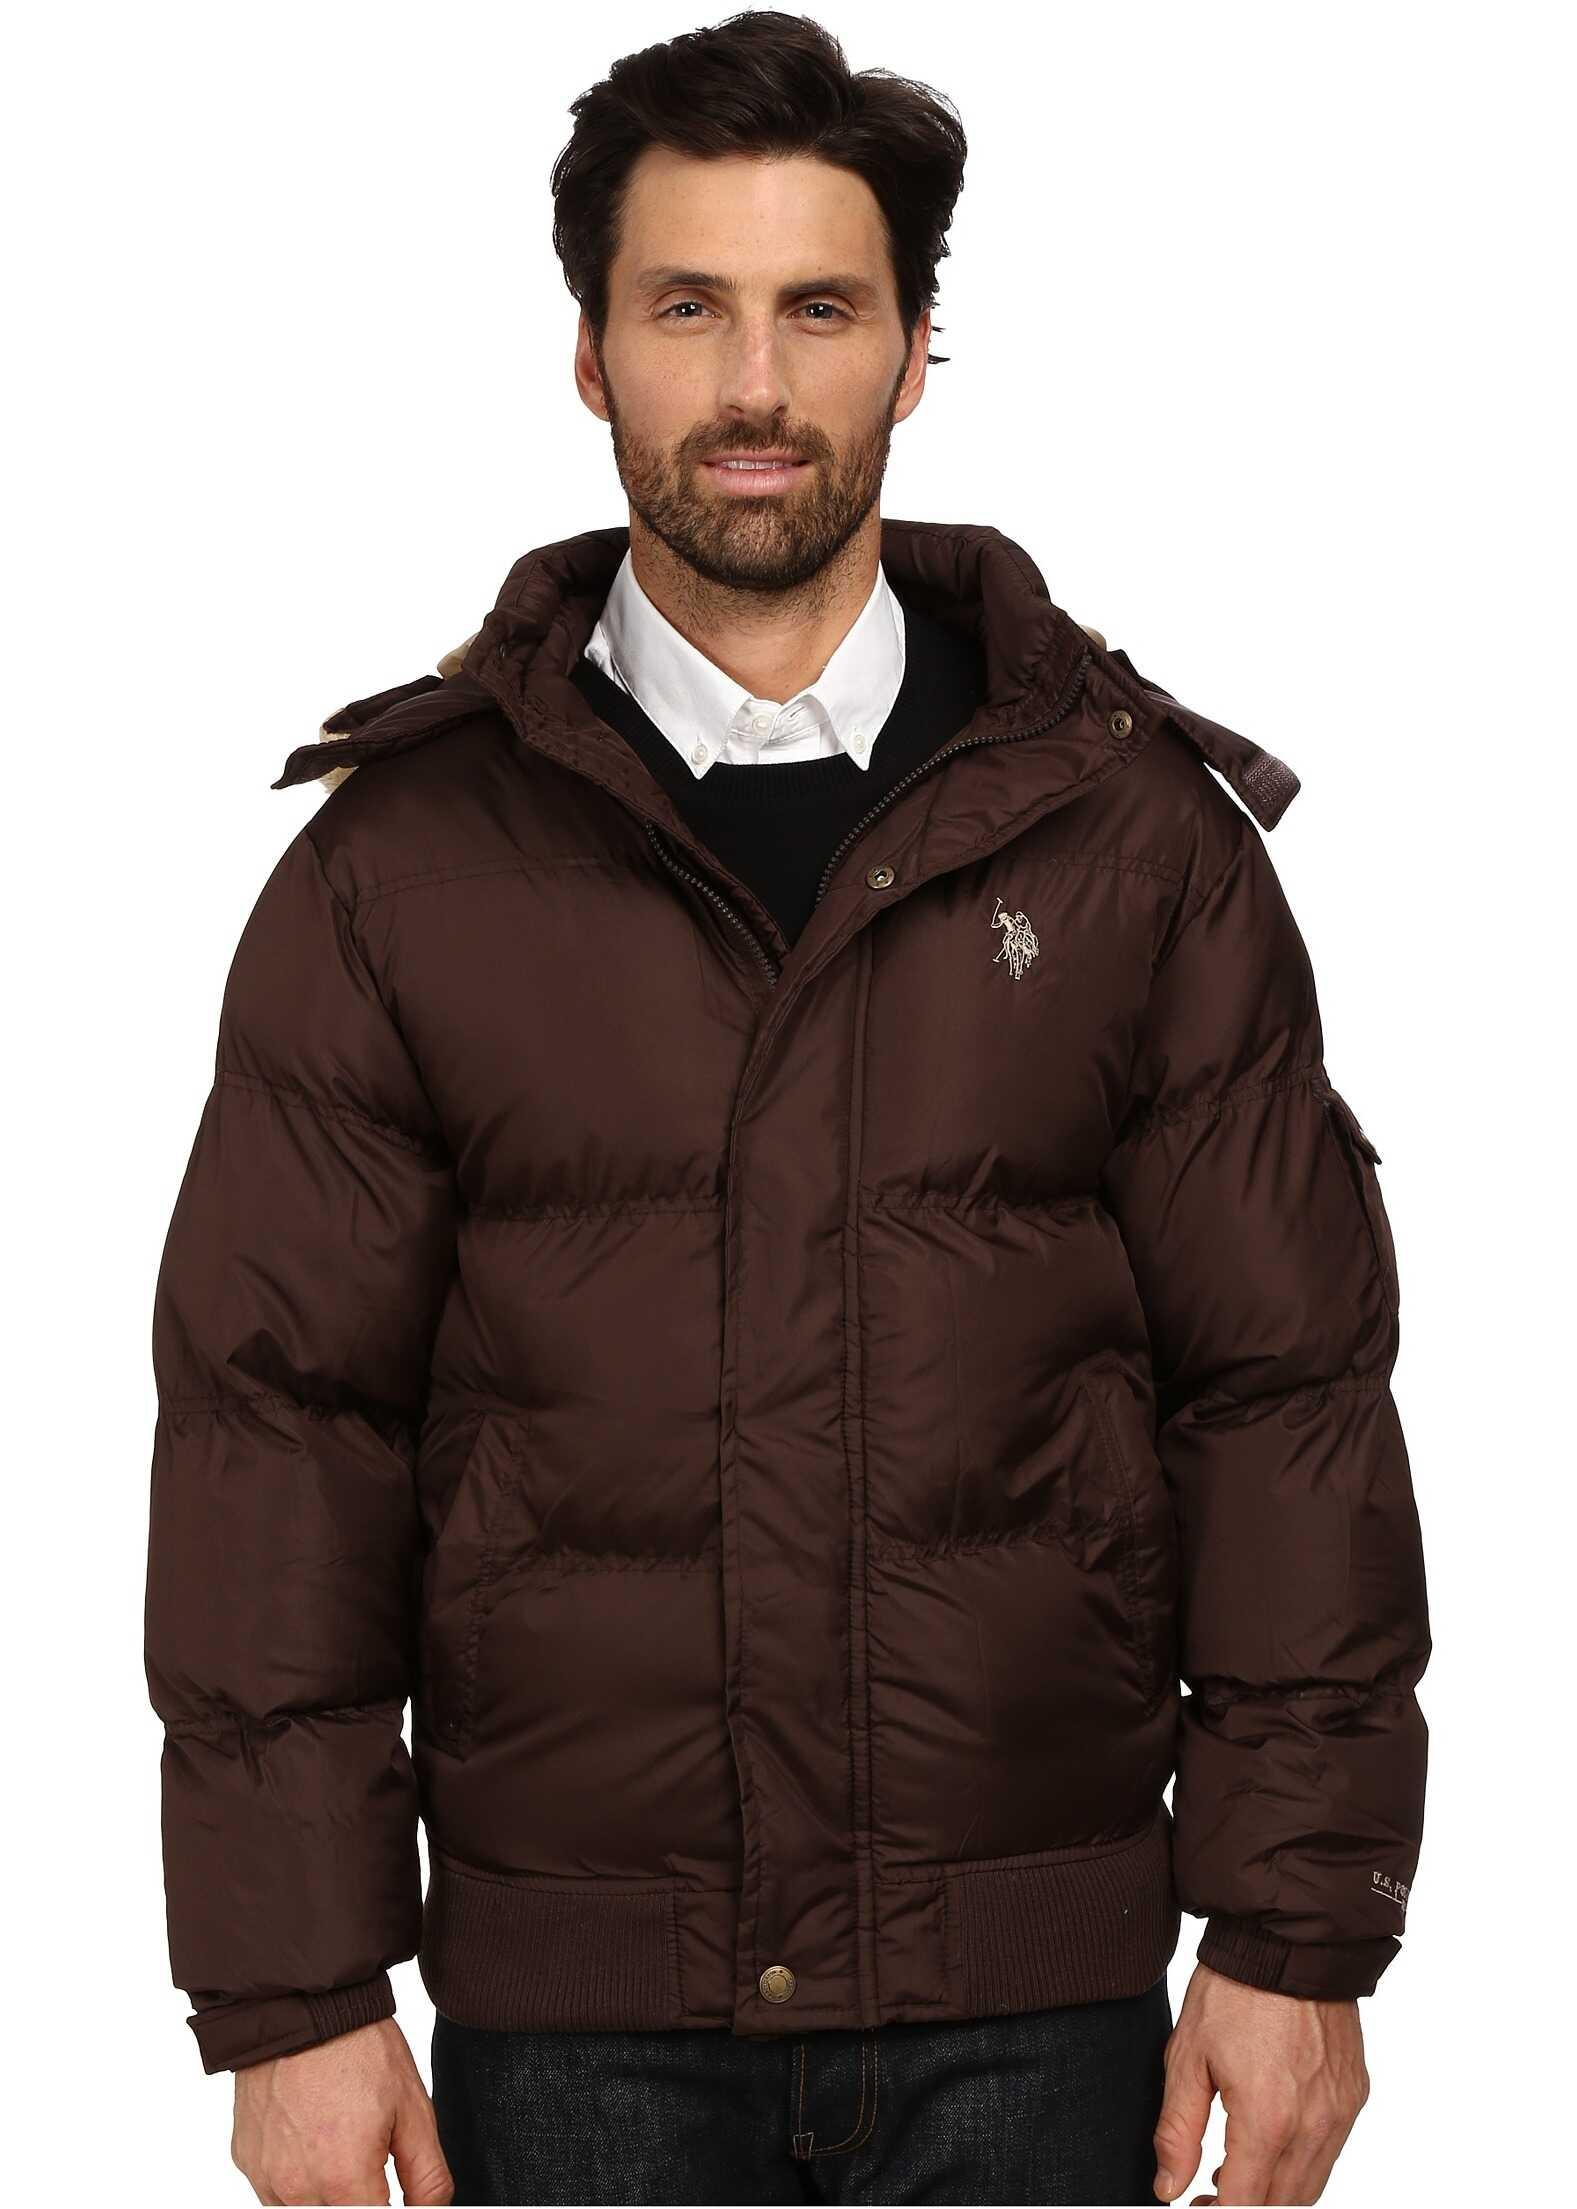 U.S. POLO ASSN. Short Snorkel Jacket Dark Brown